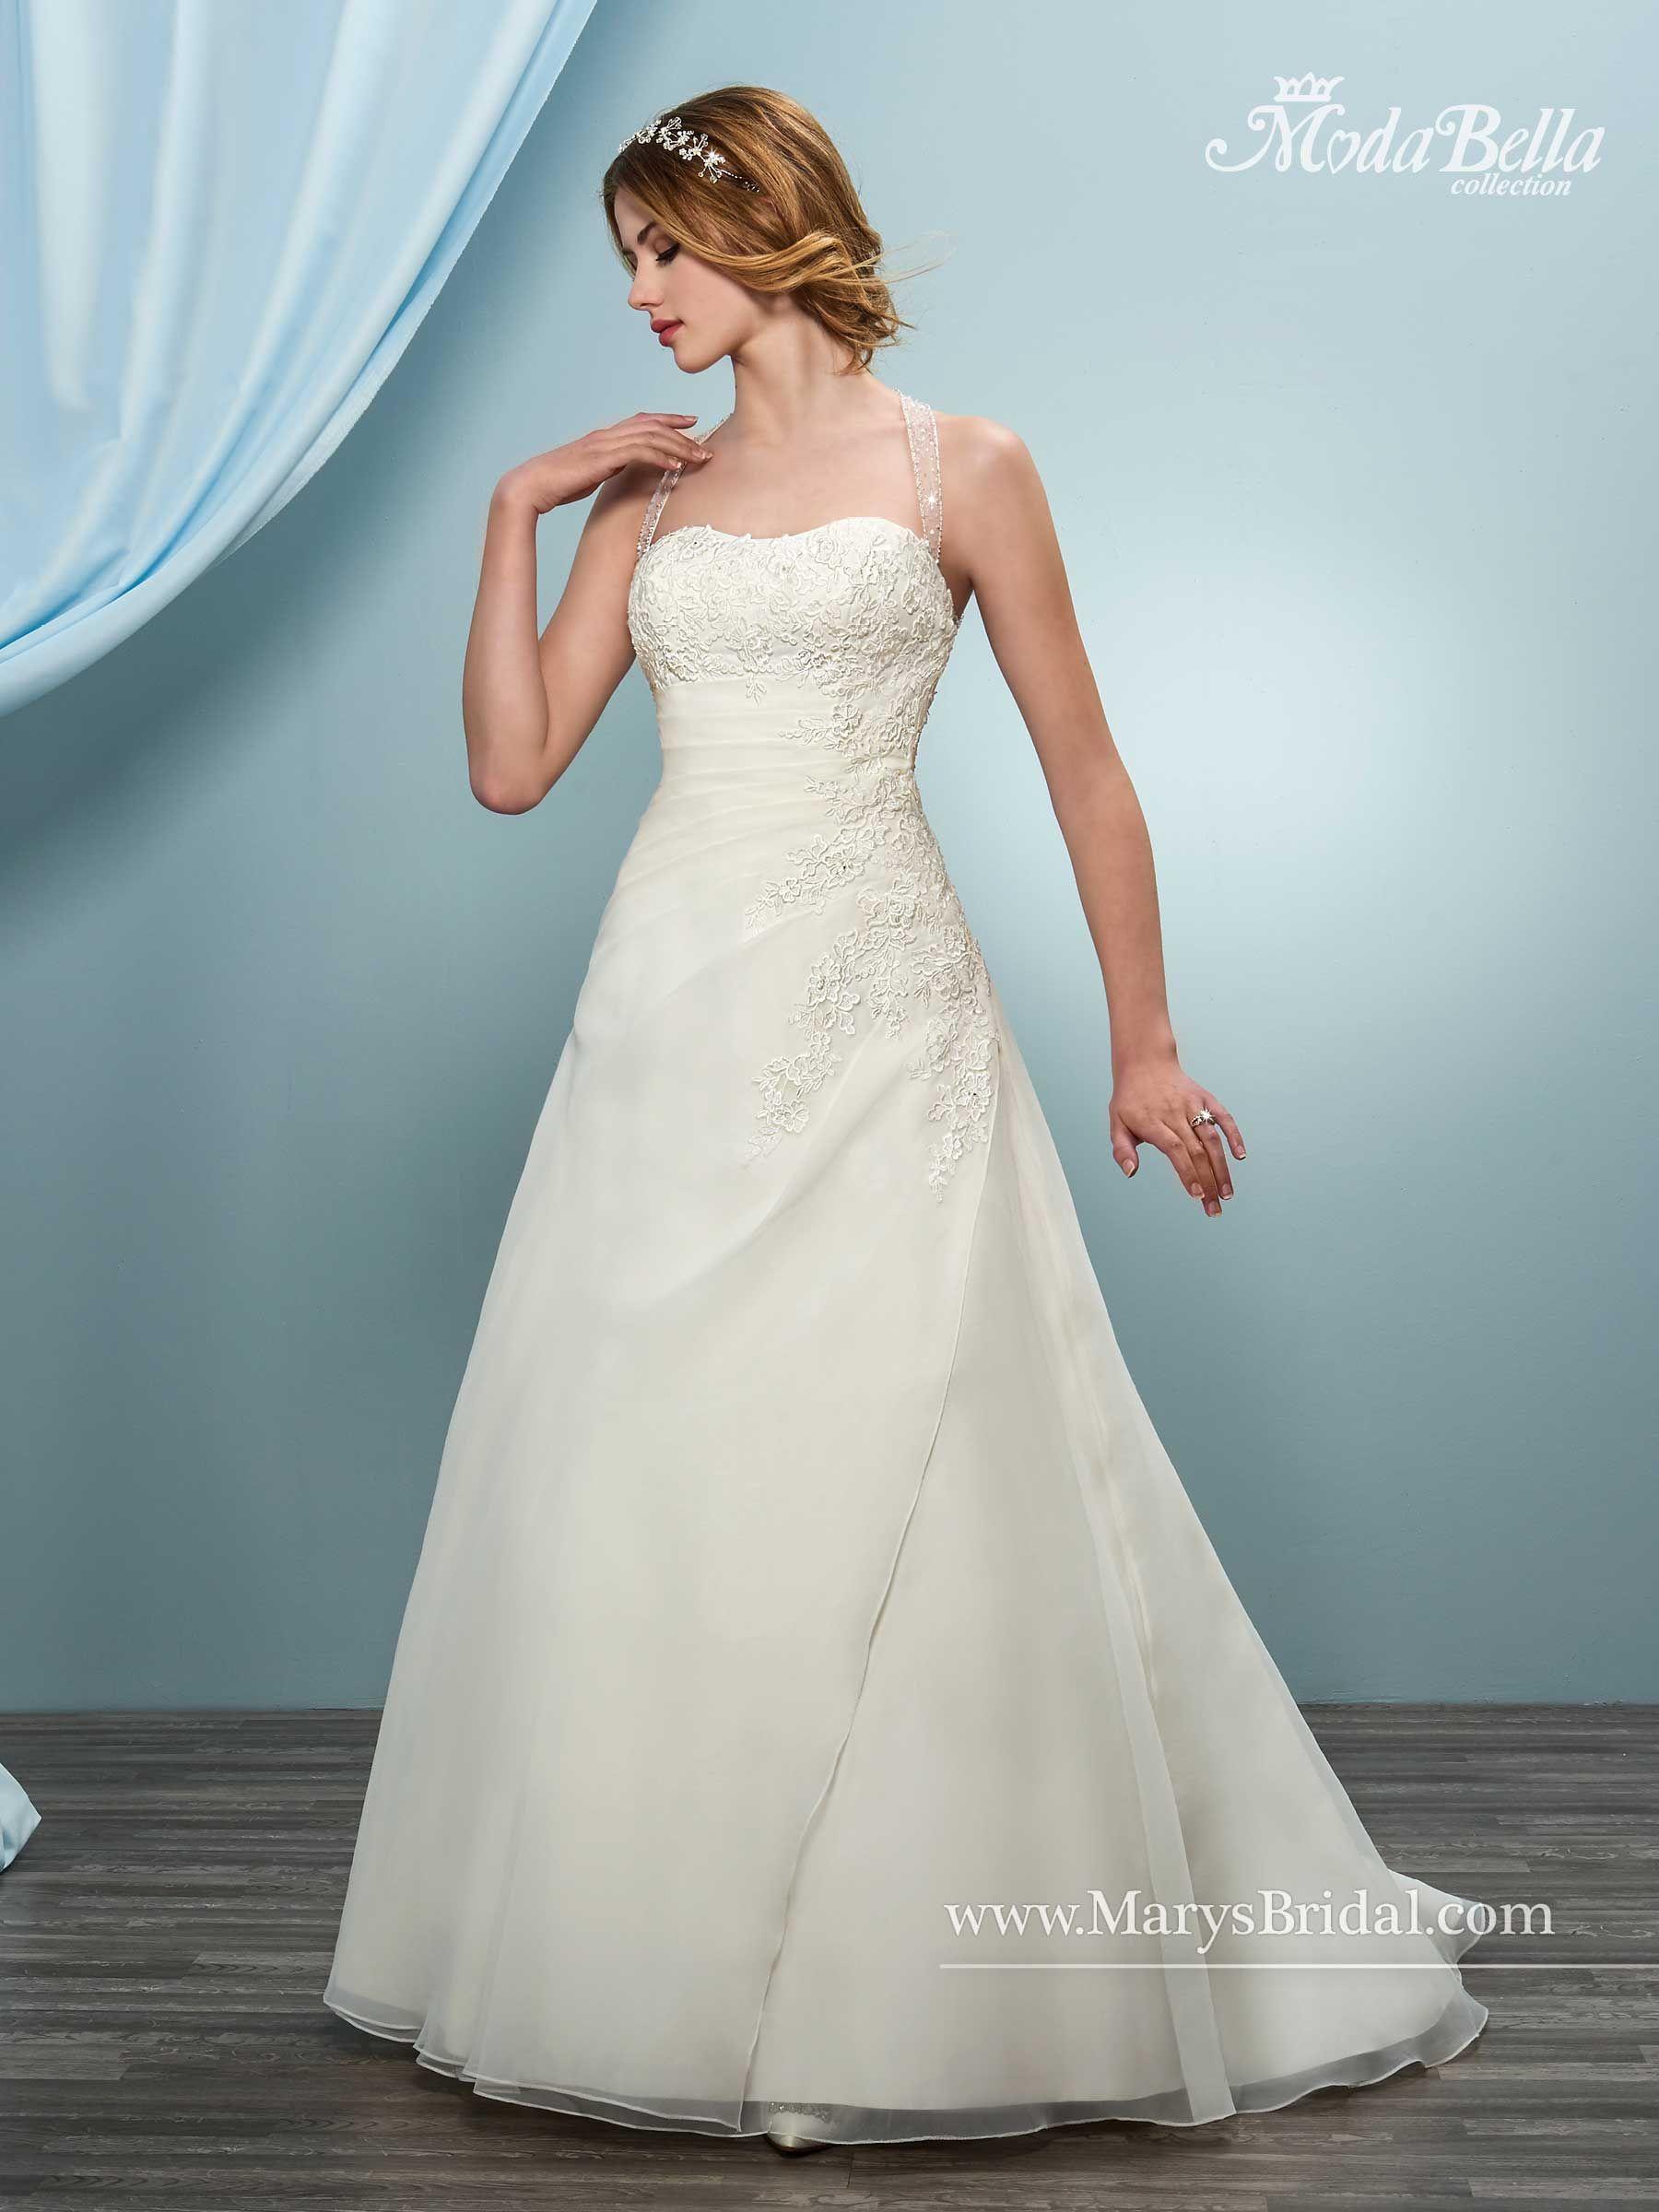 Halter style wedding dresses  Style Y  Wedding dresses  Pinterest  Wedding dress Gowns and